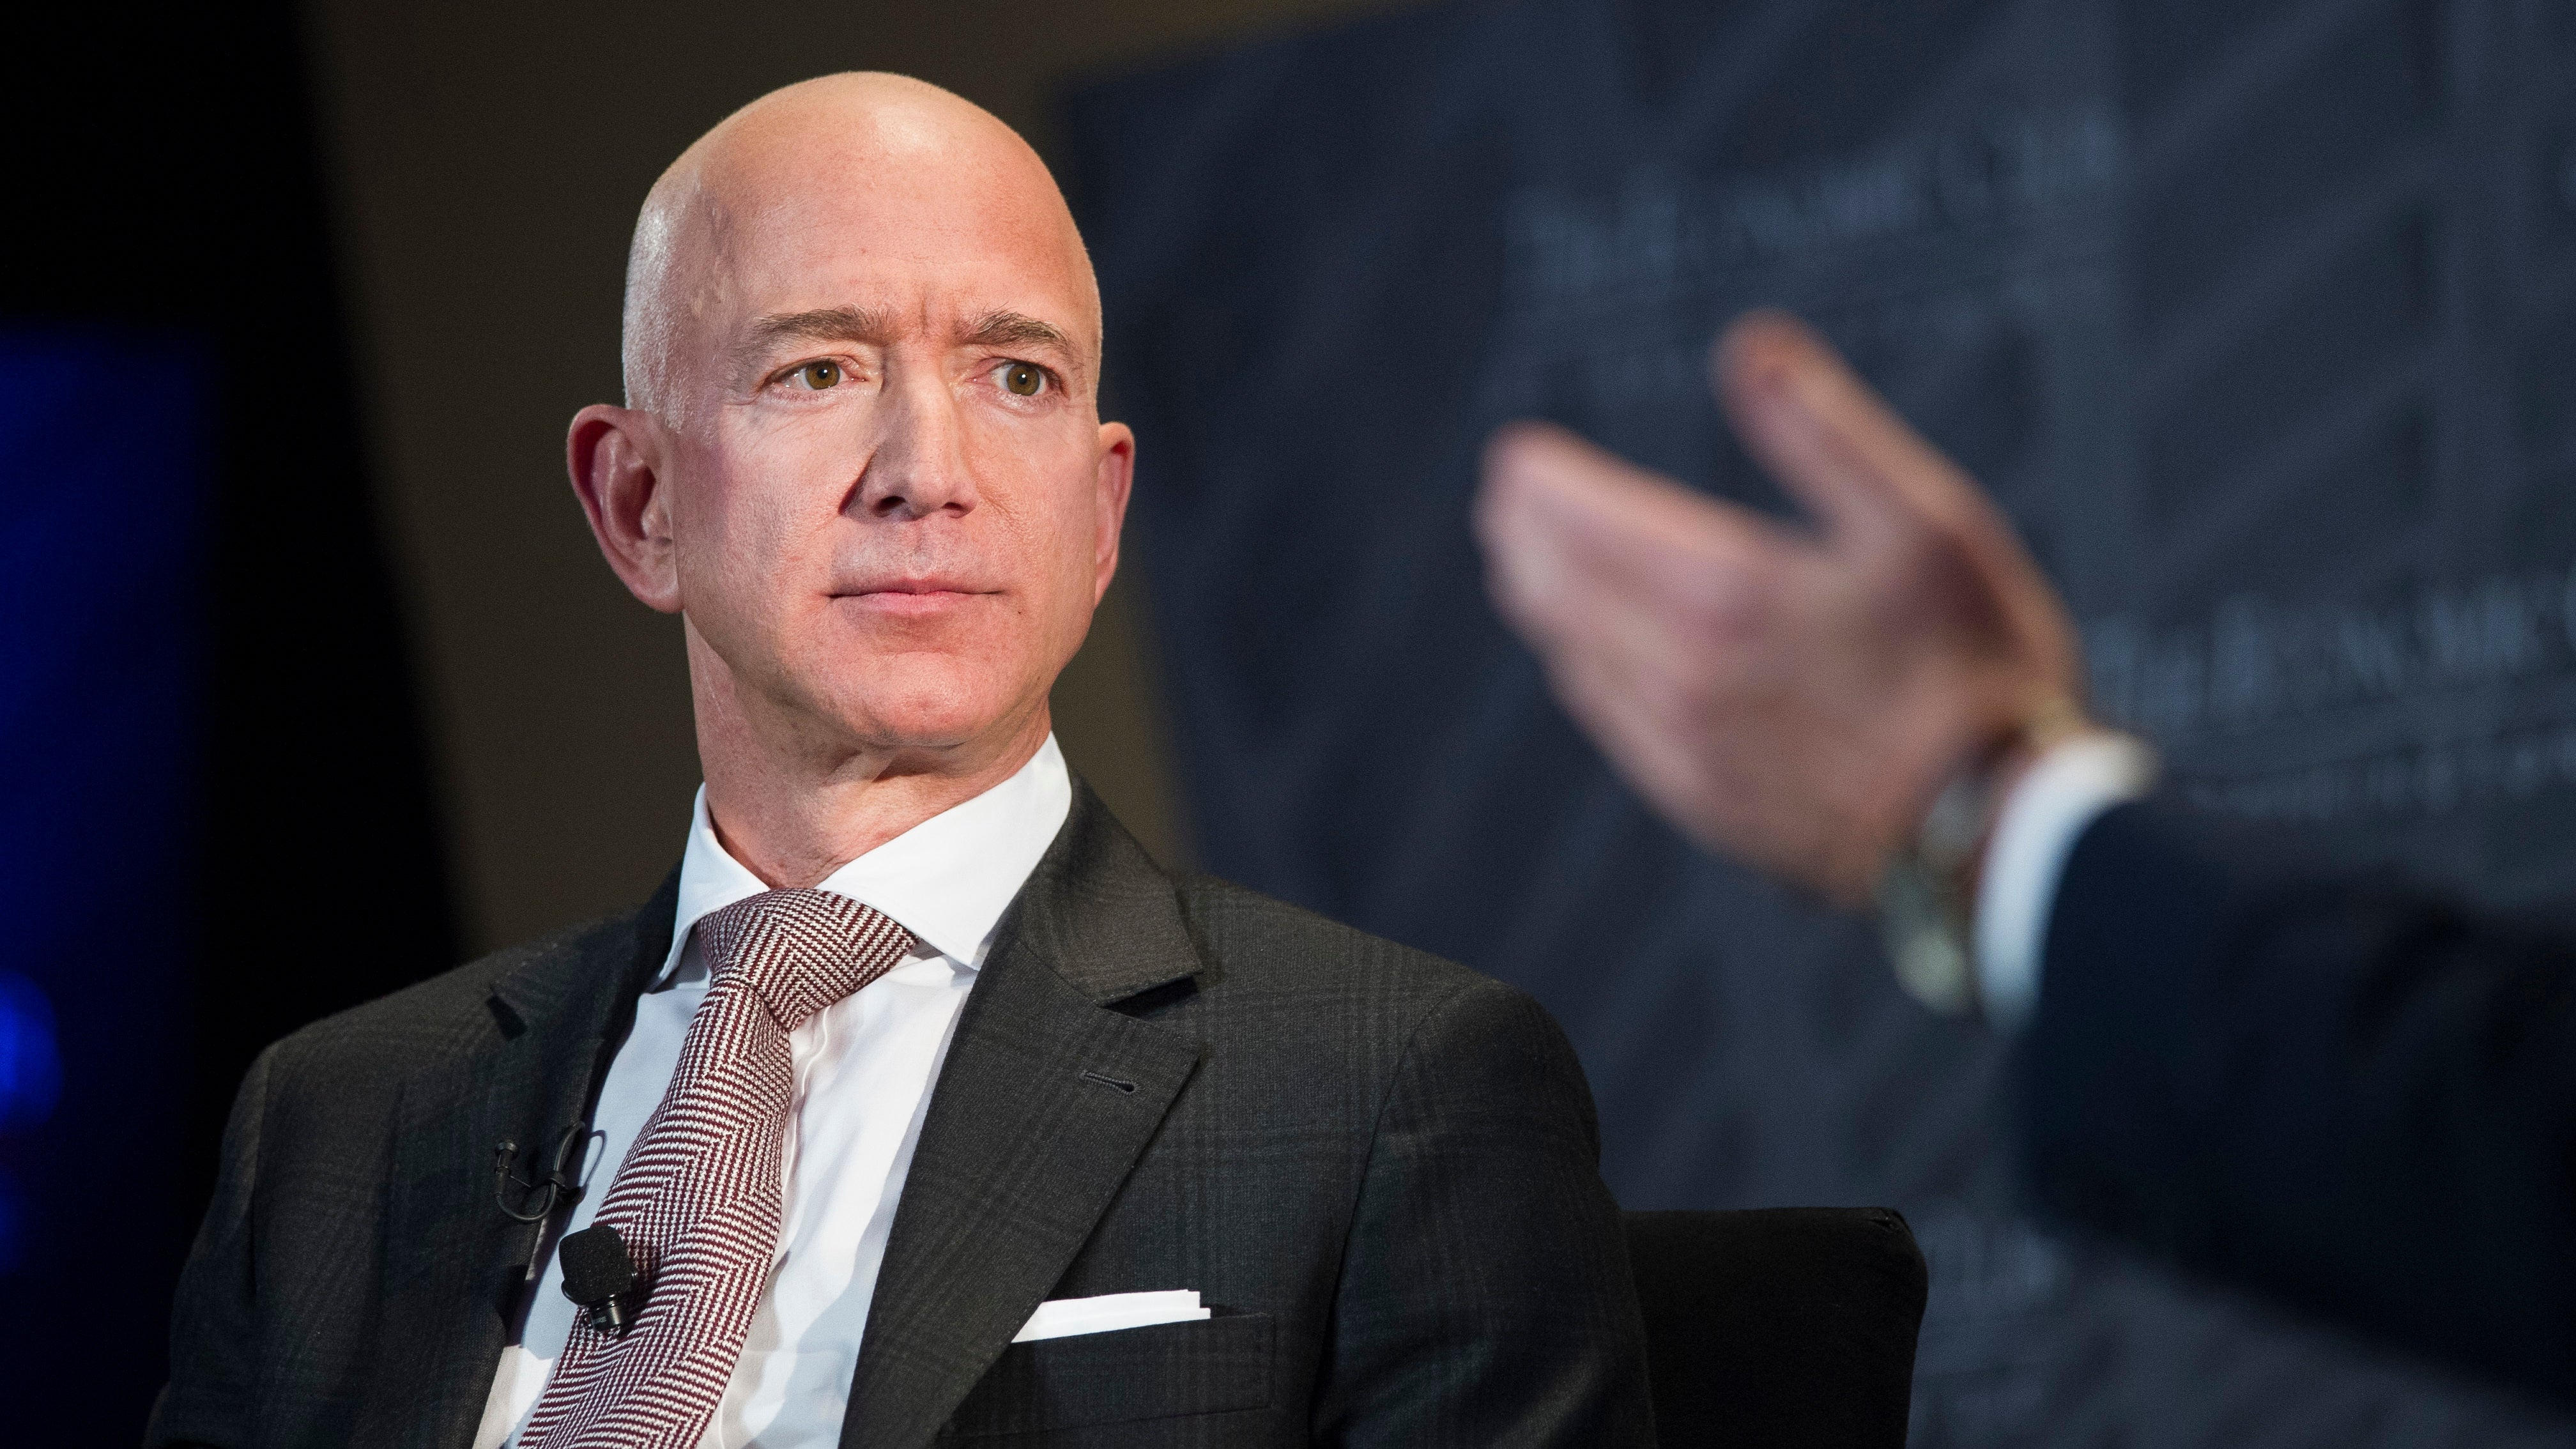 Investigator Jeff Bezos Hired To Look Into Who Got His Dick Pics Says Saudis Broke Into Bezos's Phone